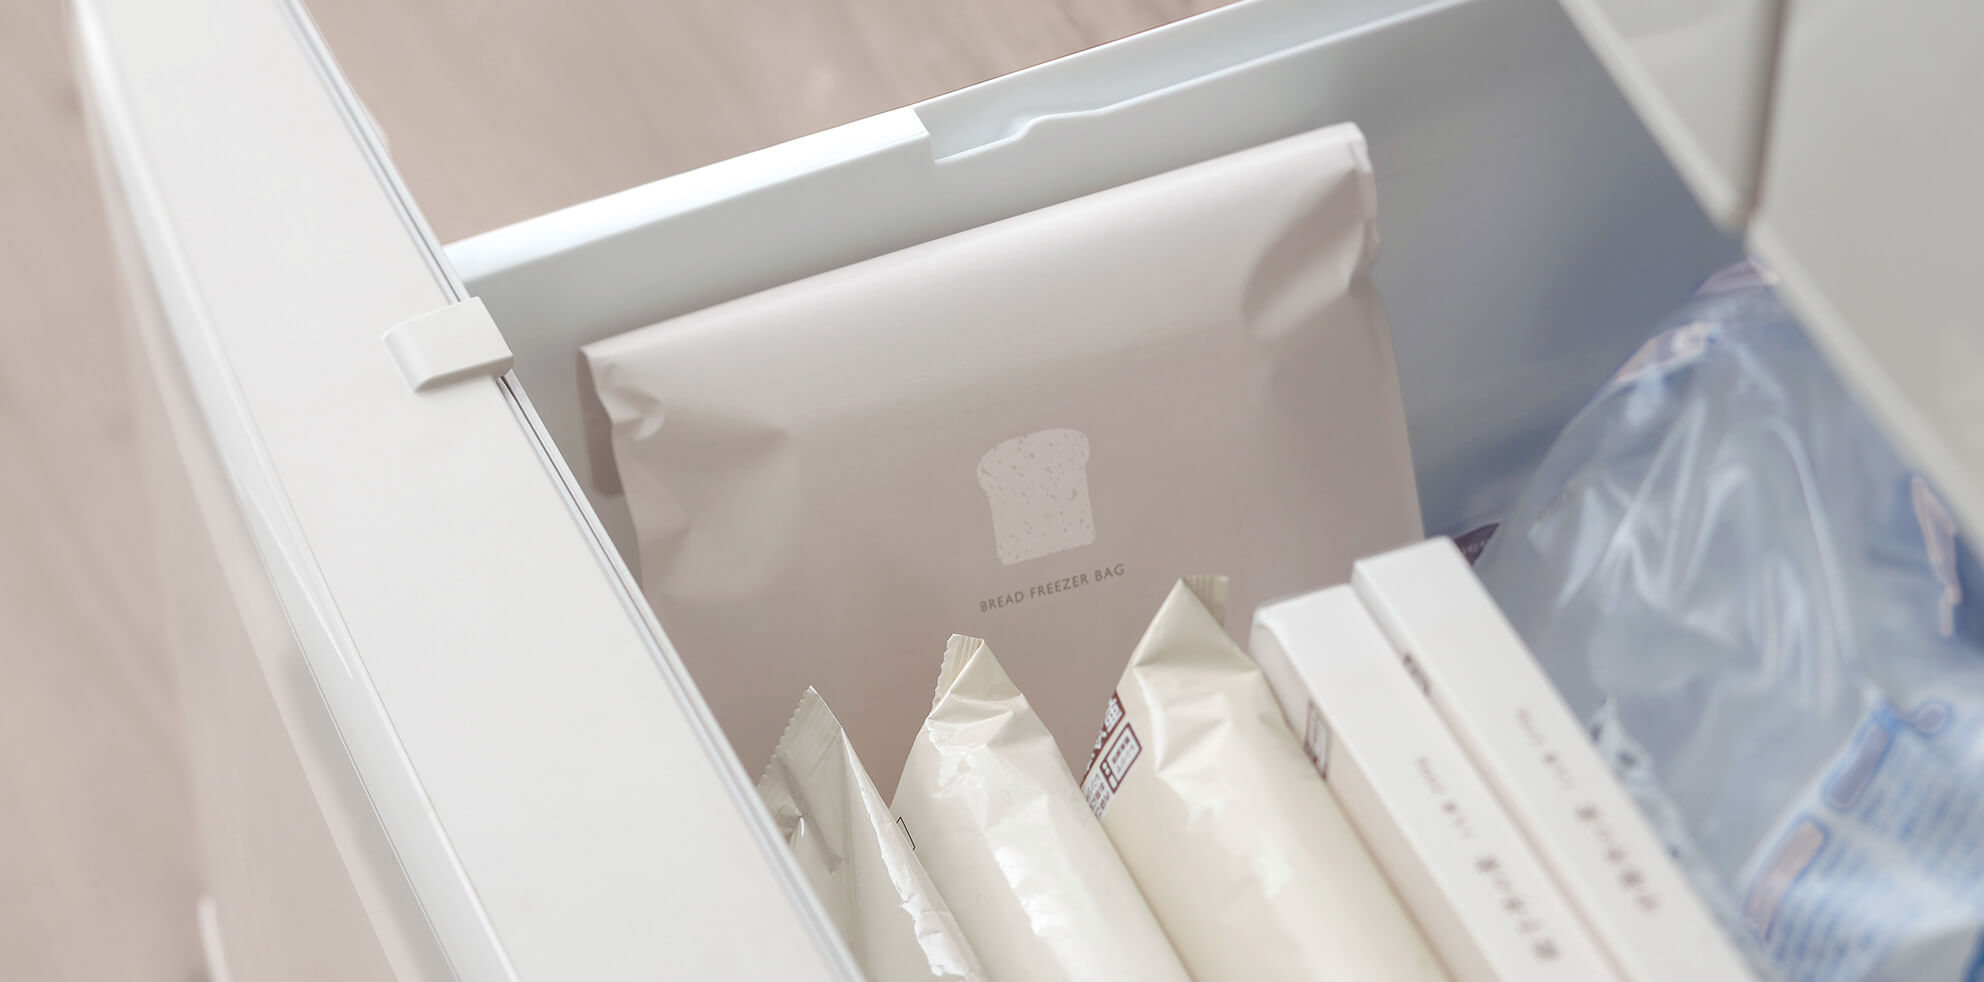 消費 パン 期限 冷凍